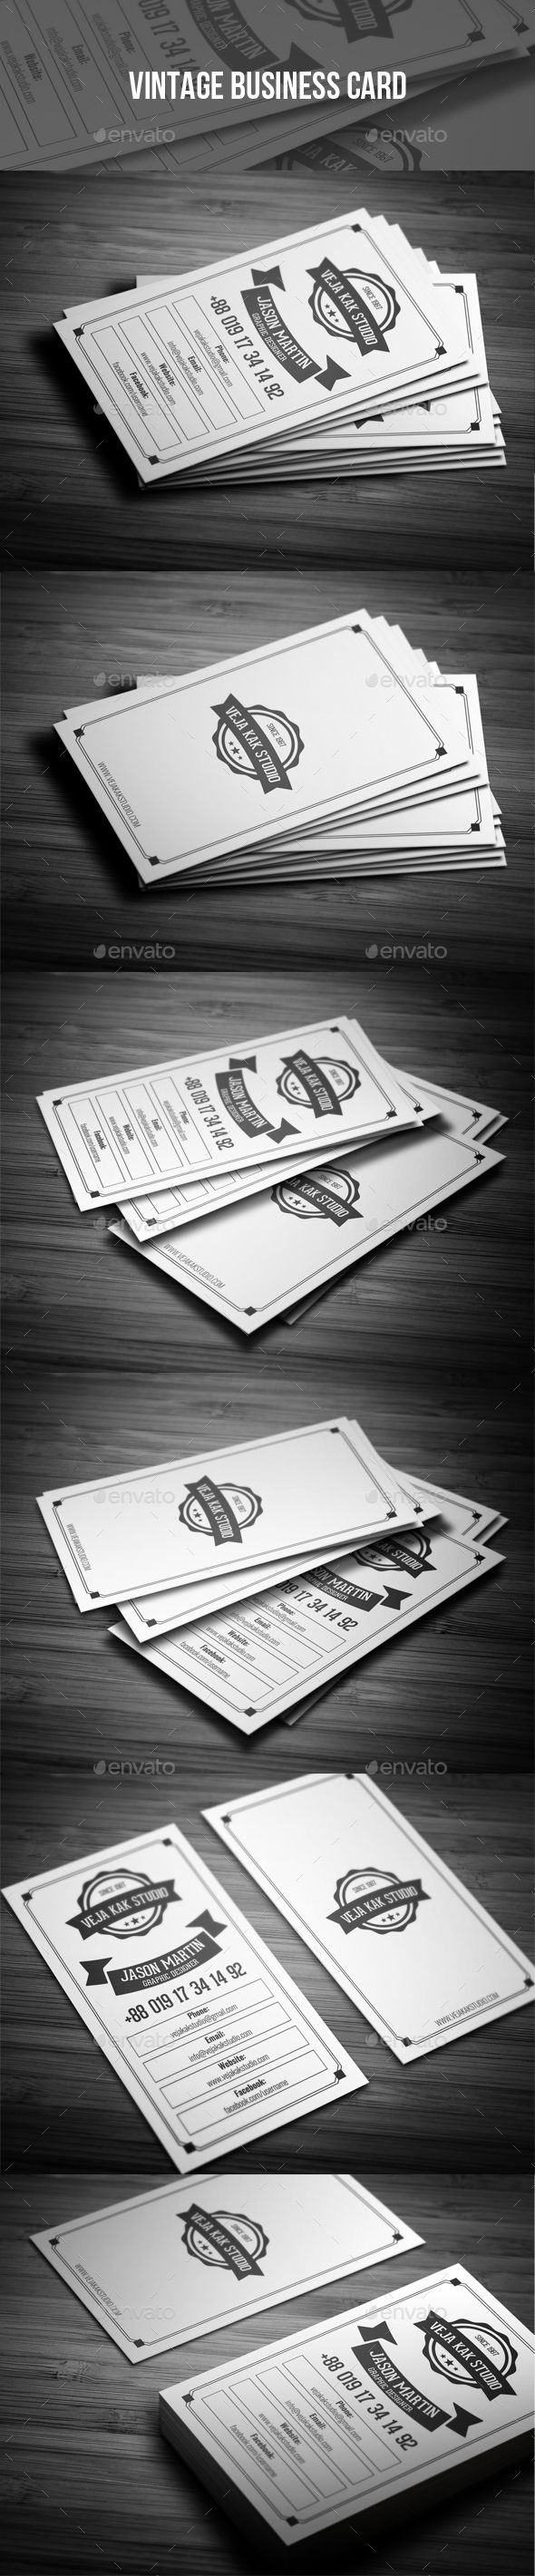 Vintage Business Card - Retro/Vintage Business Cards Download here : https://graphicriver.net/item/vintage-business-card/19398183?s_rank=102&ref=Al-fatih